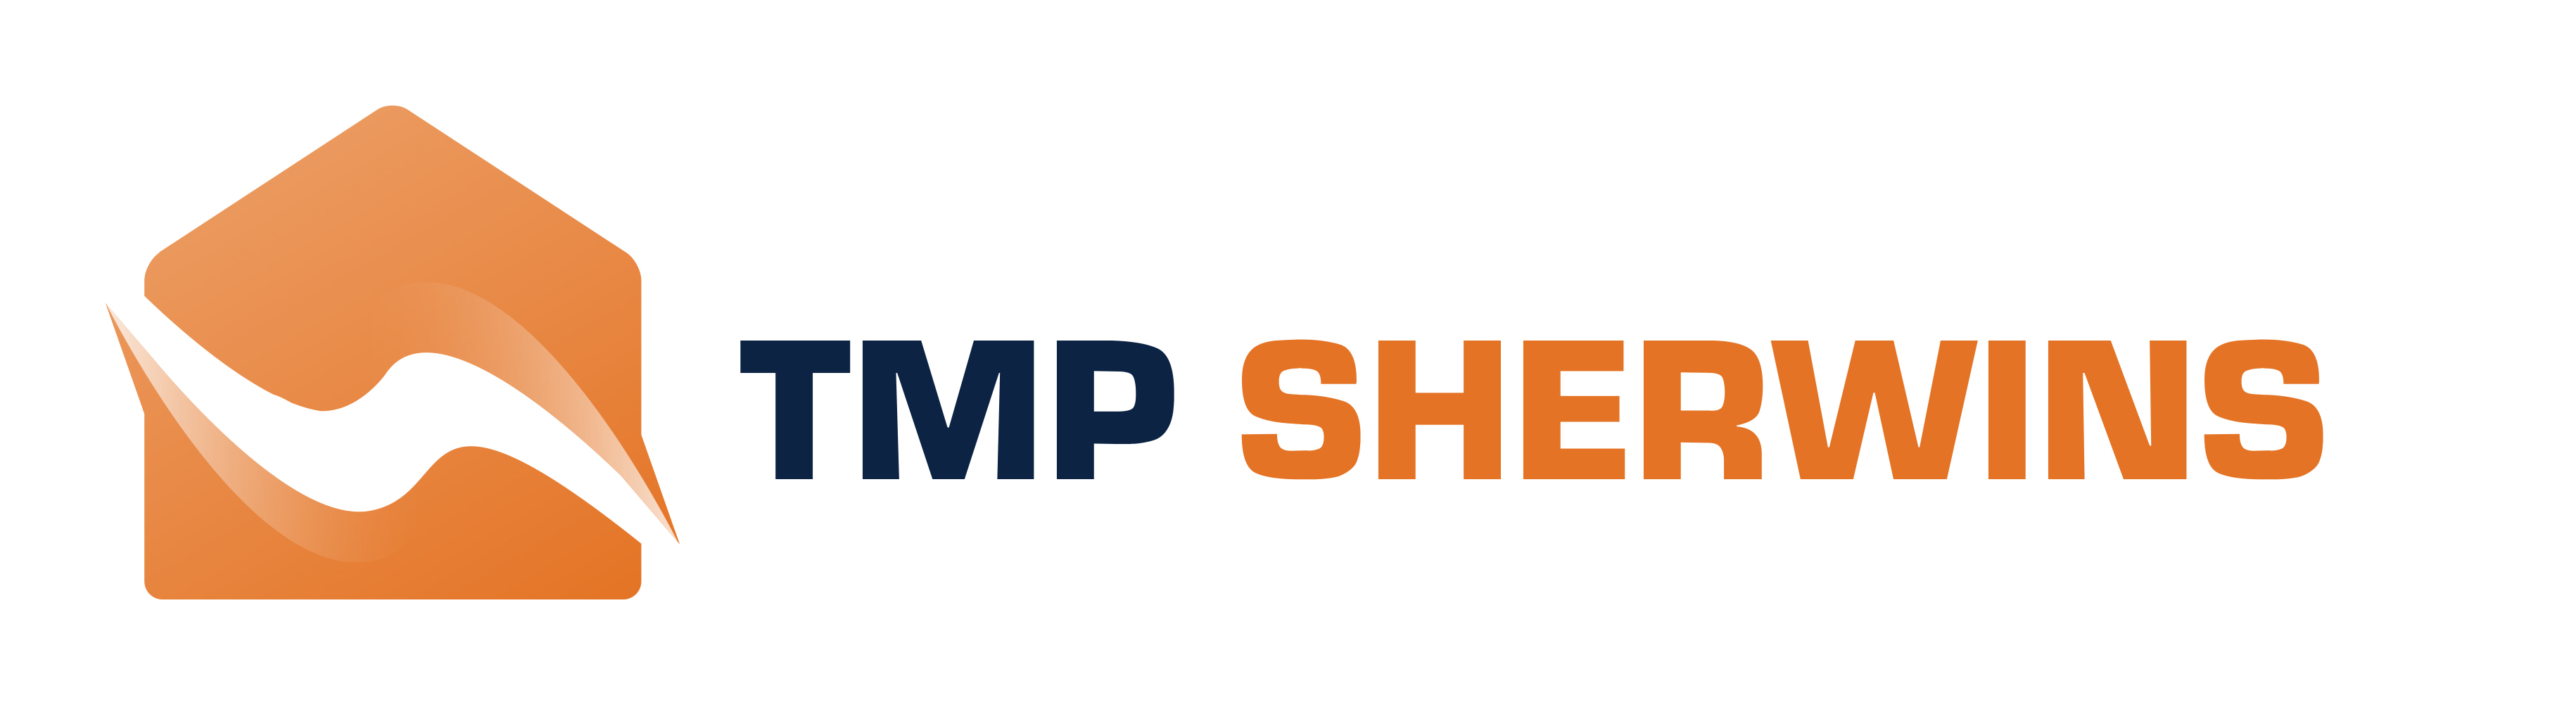 TMP Sherwins